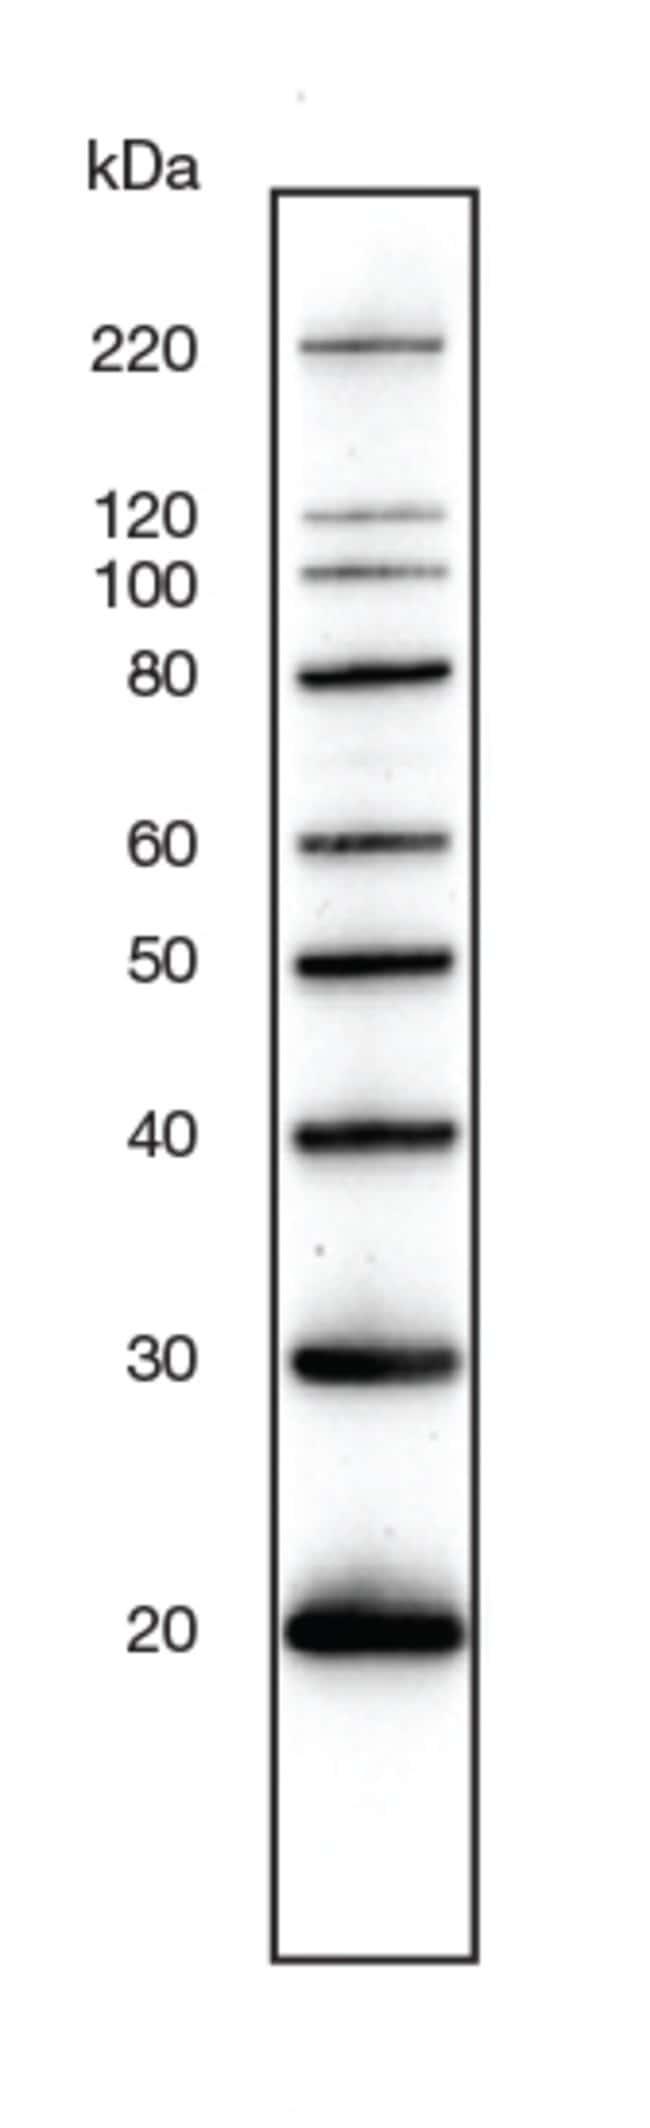 MagicMark XP Western Protein Standard band profile